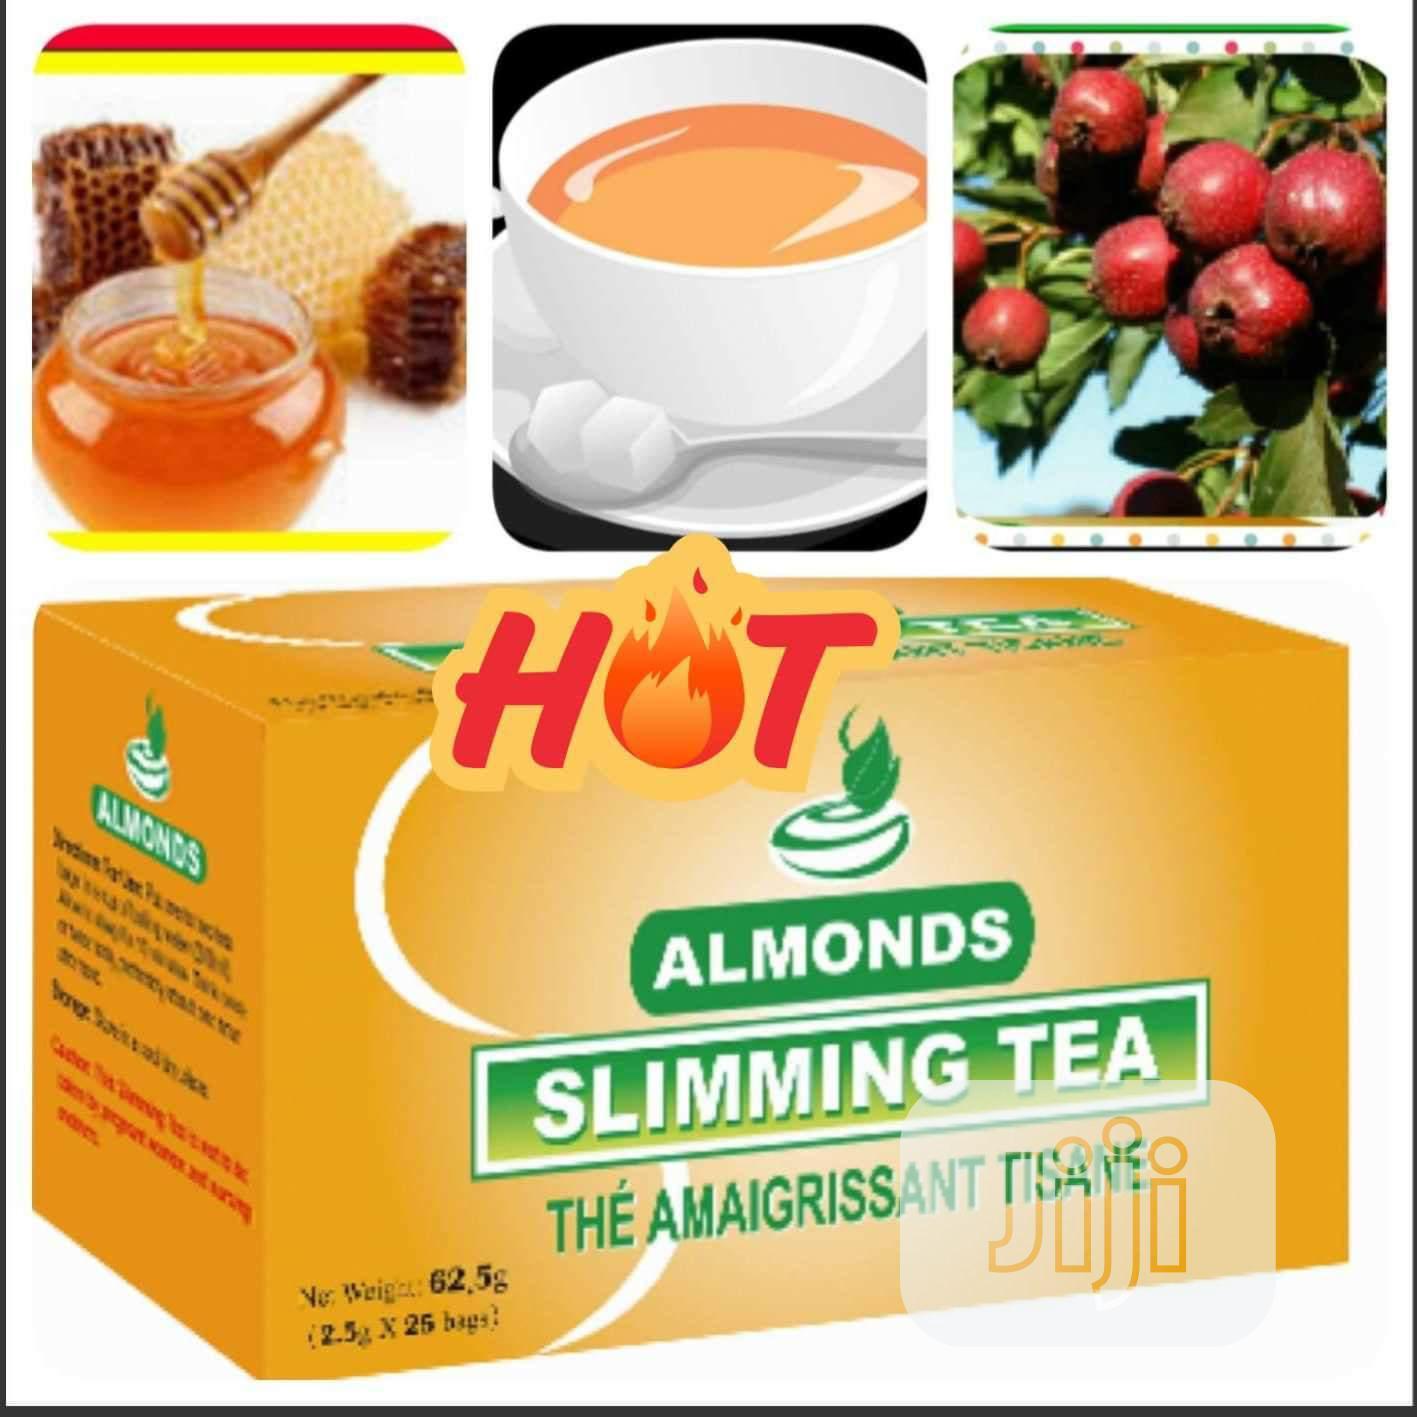 Almonds Slimming Tea